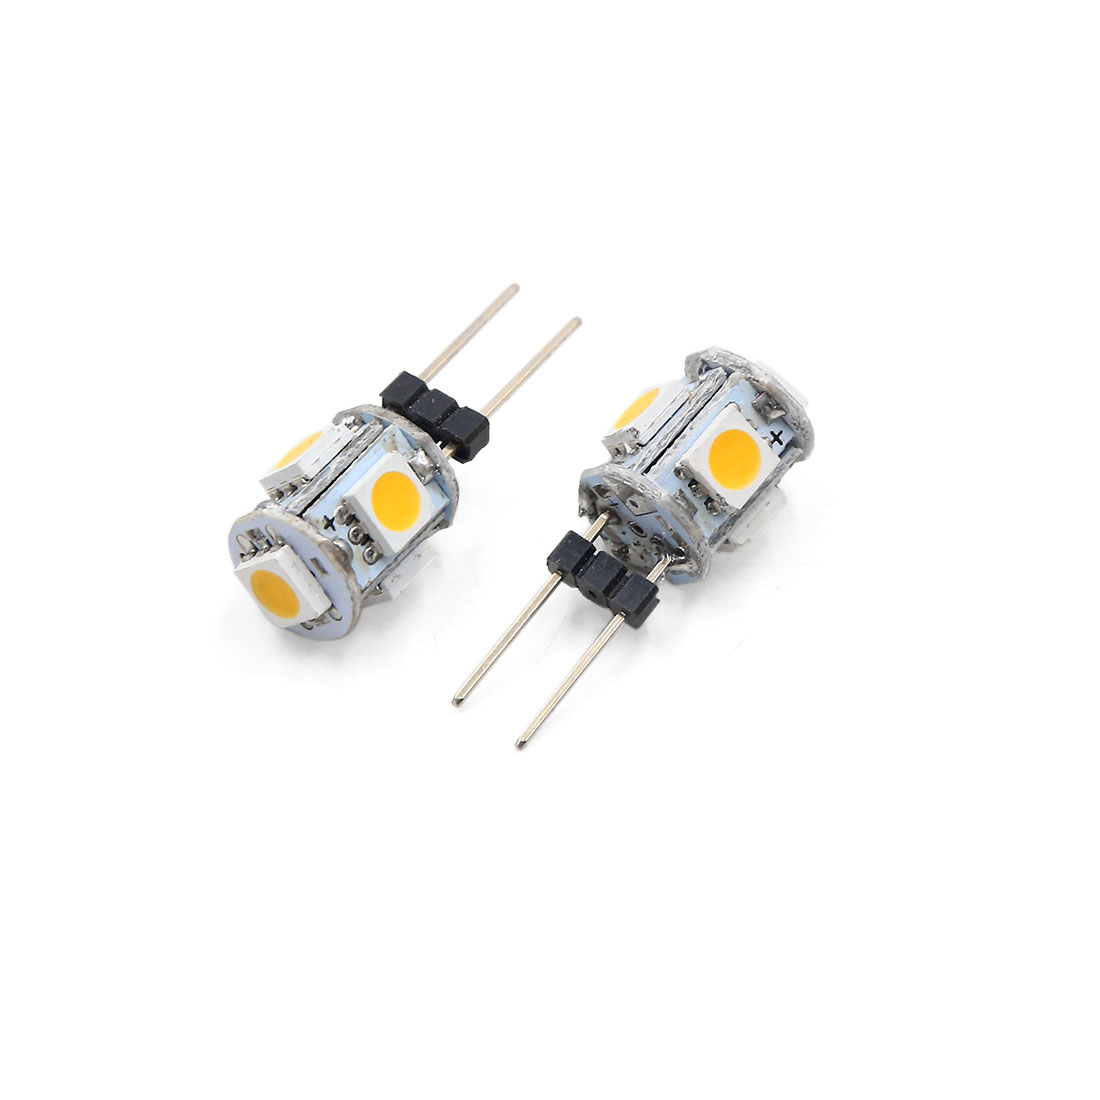 10 Pcs G4 Base 5050 SMD 5 LED Warm White Auto Car Dashboard